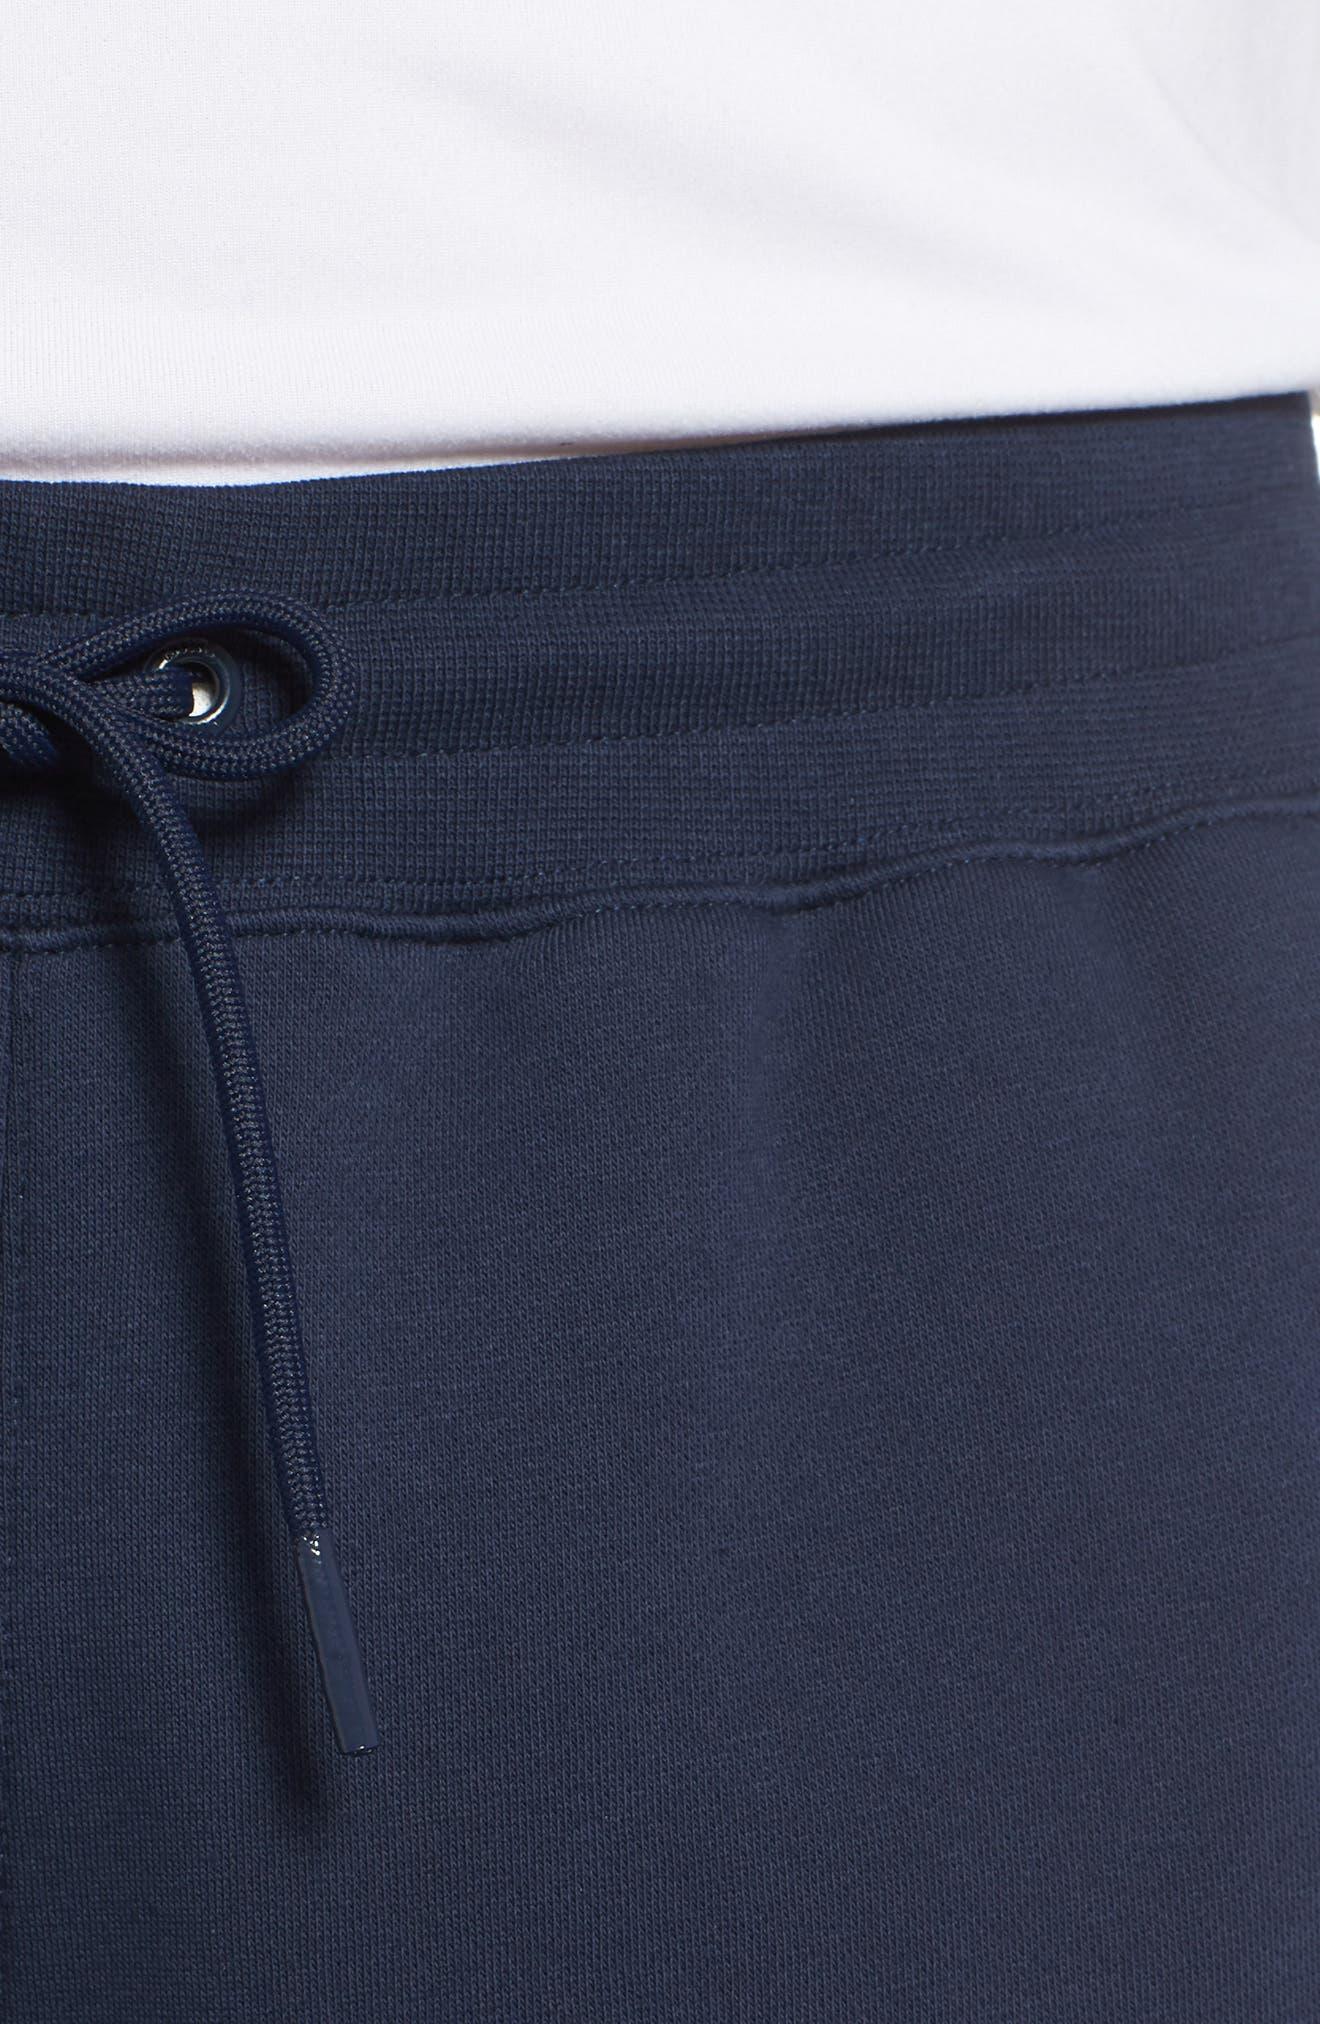 Sportswear Air Fleece Shorts,                             Alternate thumbnail 4, color,                             452